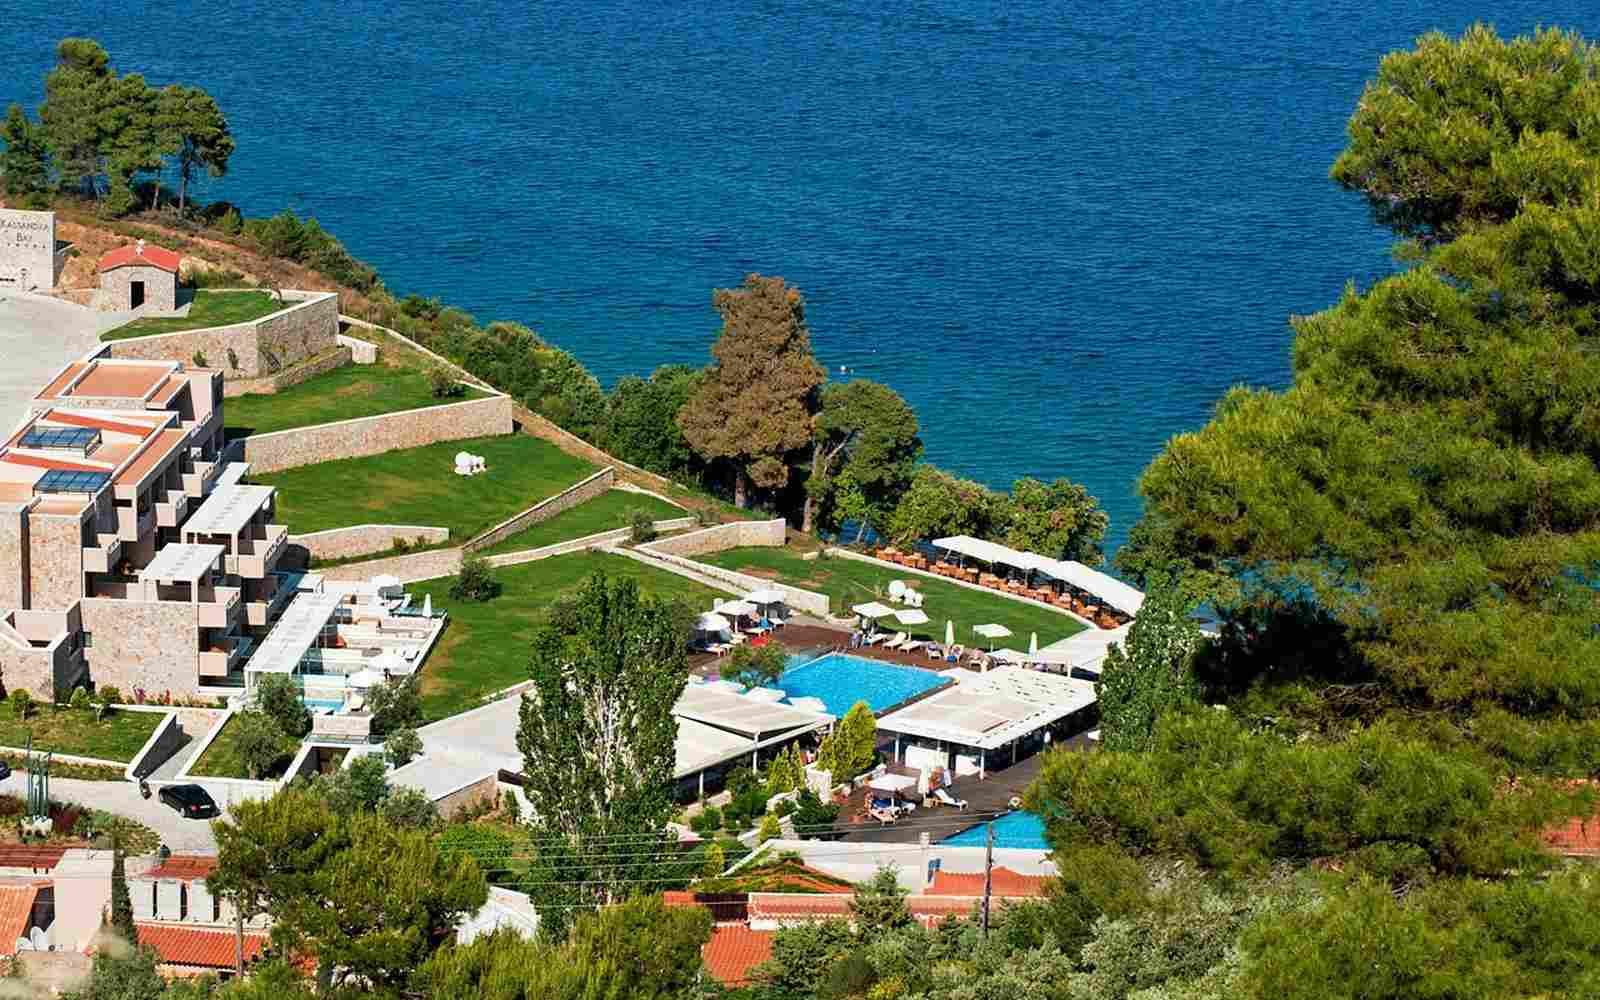 http://www.casacaribepuertomorelos.com/wp-content/uploads/2016/03/summer-hotel-03.jpg